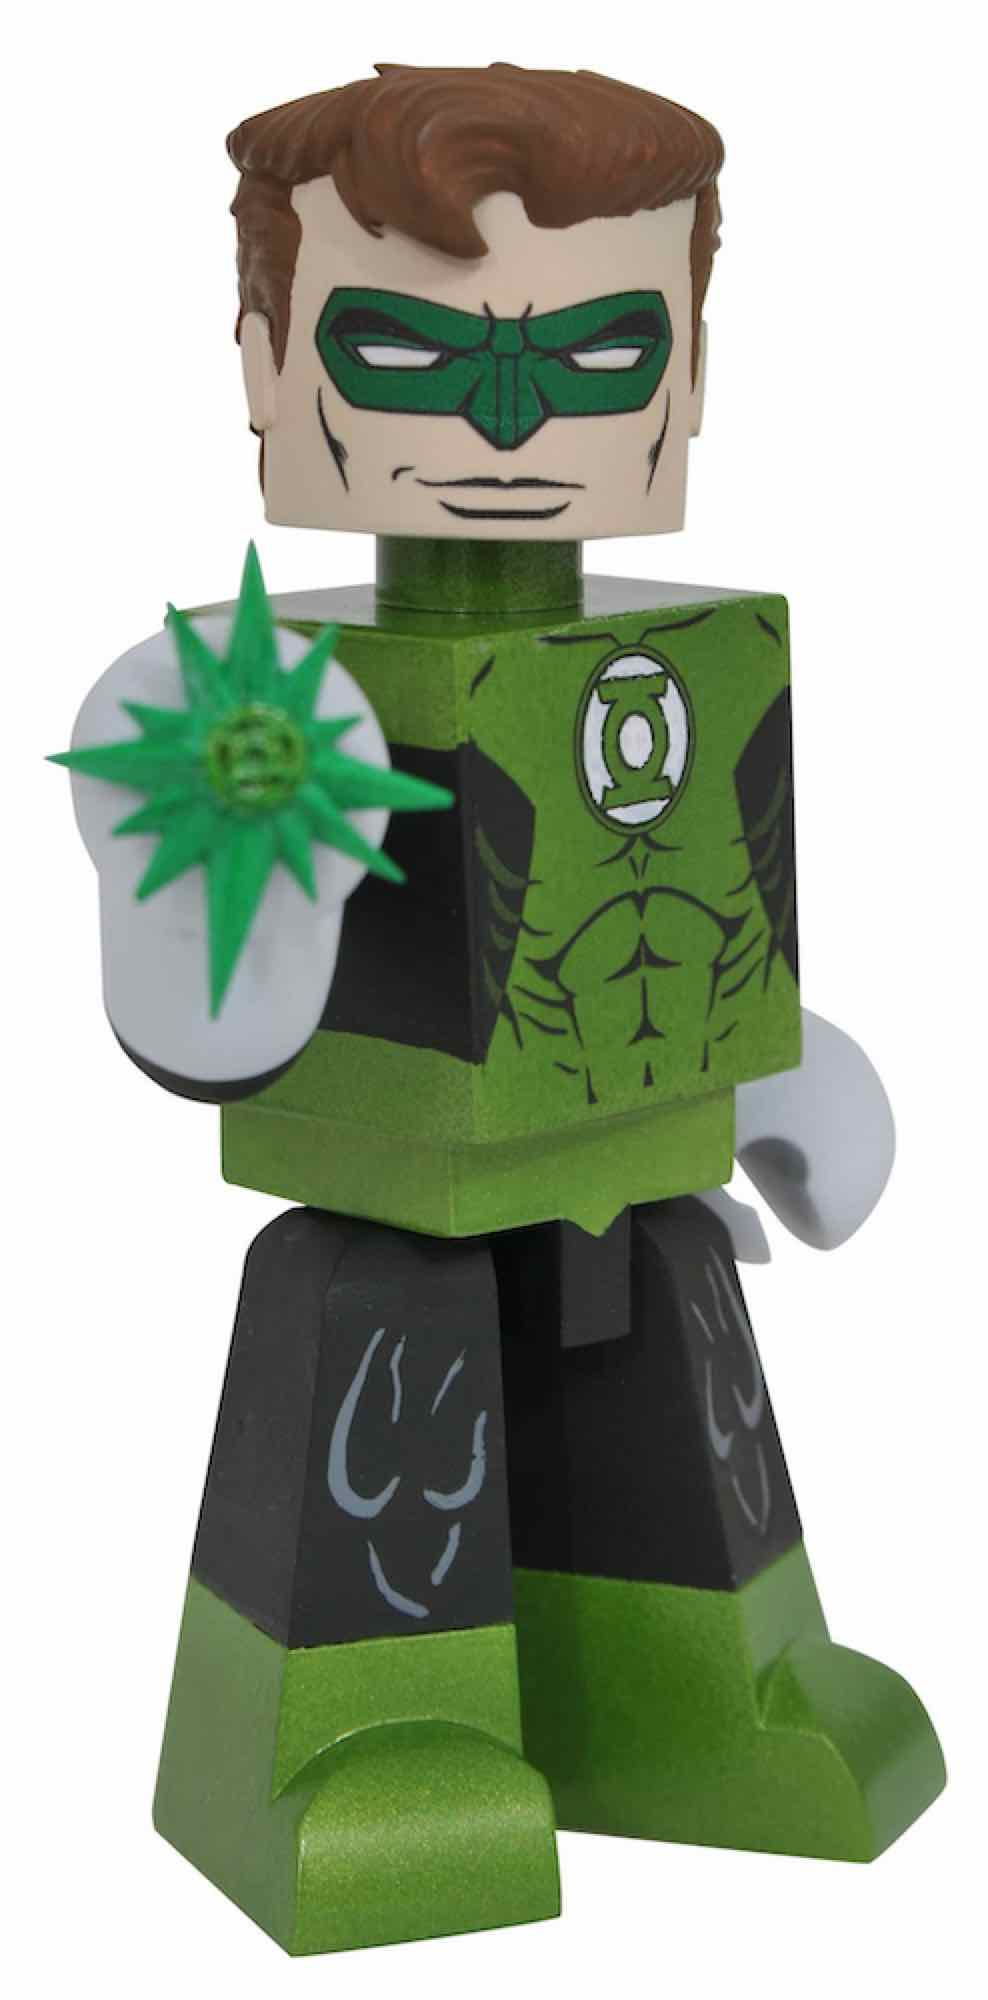 GREEN LANTERN FIGURA 10 CM VINIMATES VINYL FIGURE DC COMICS